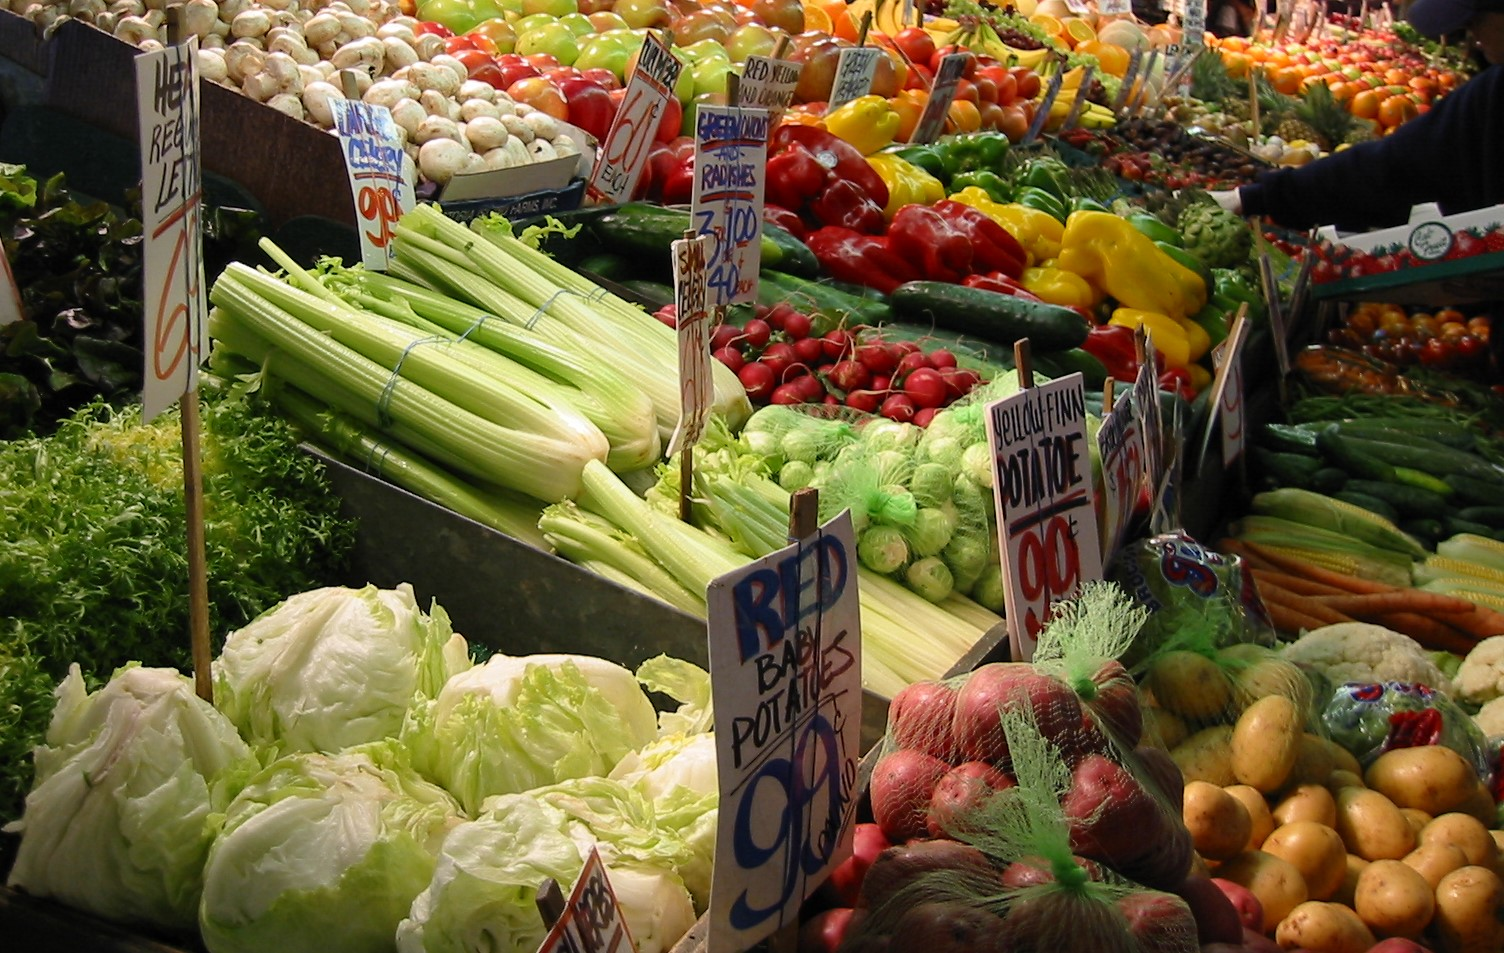 groente en fruitmarkt